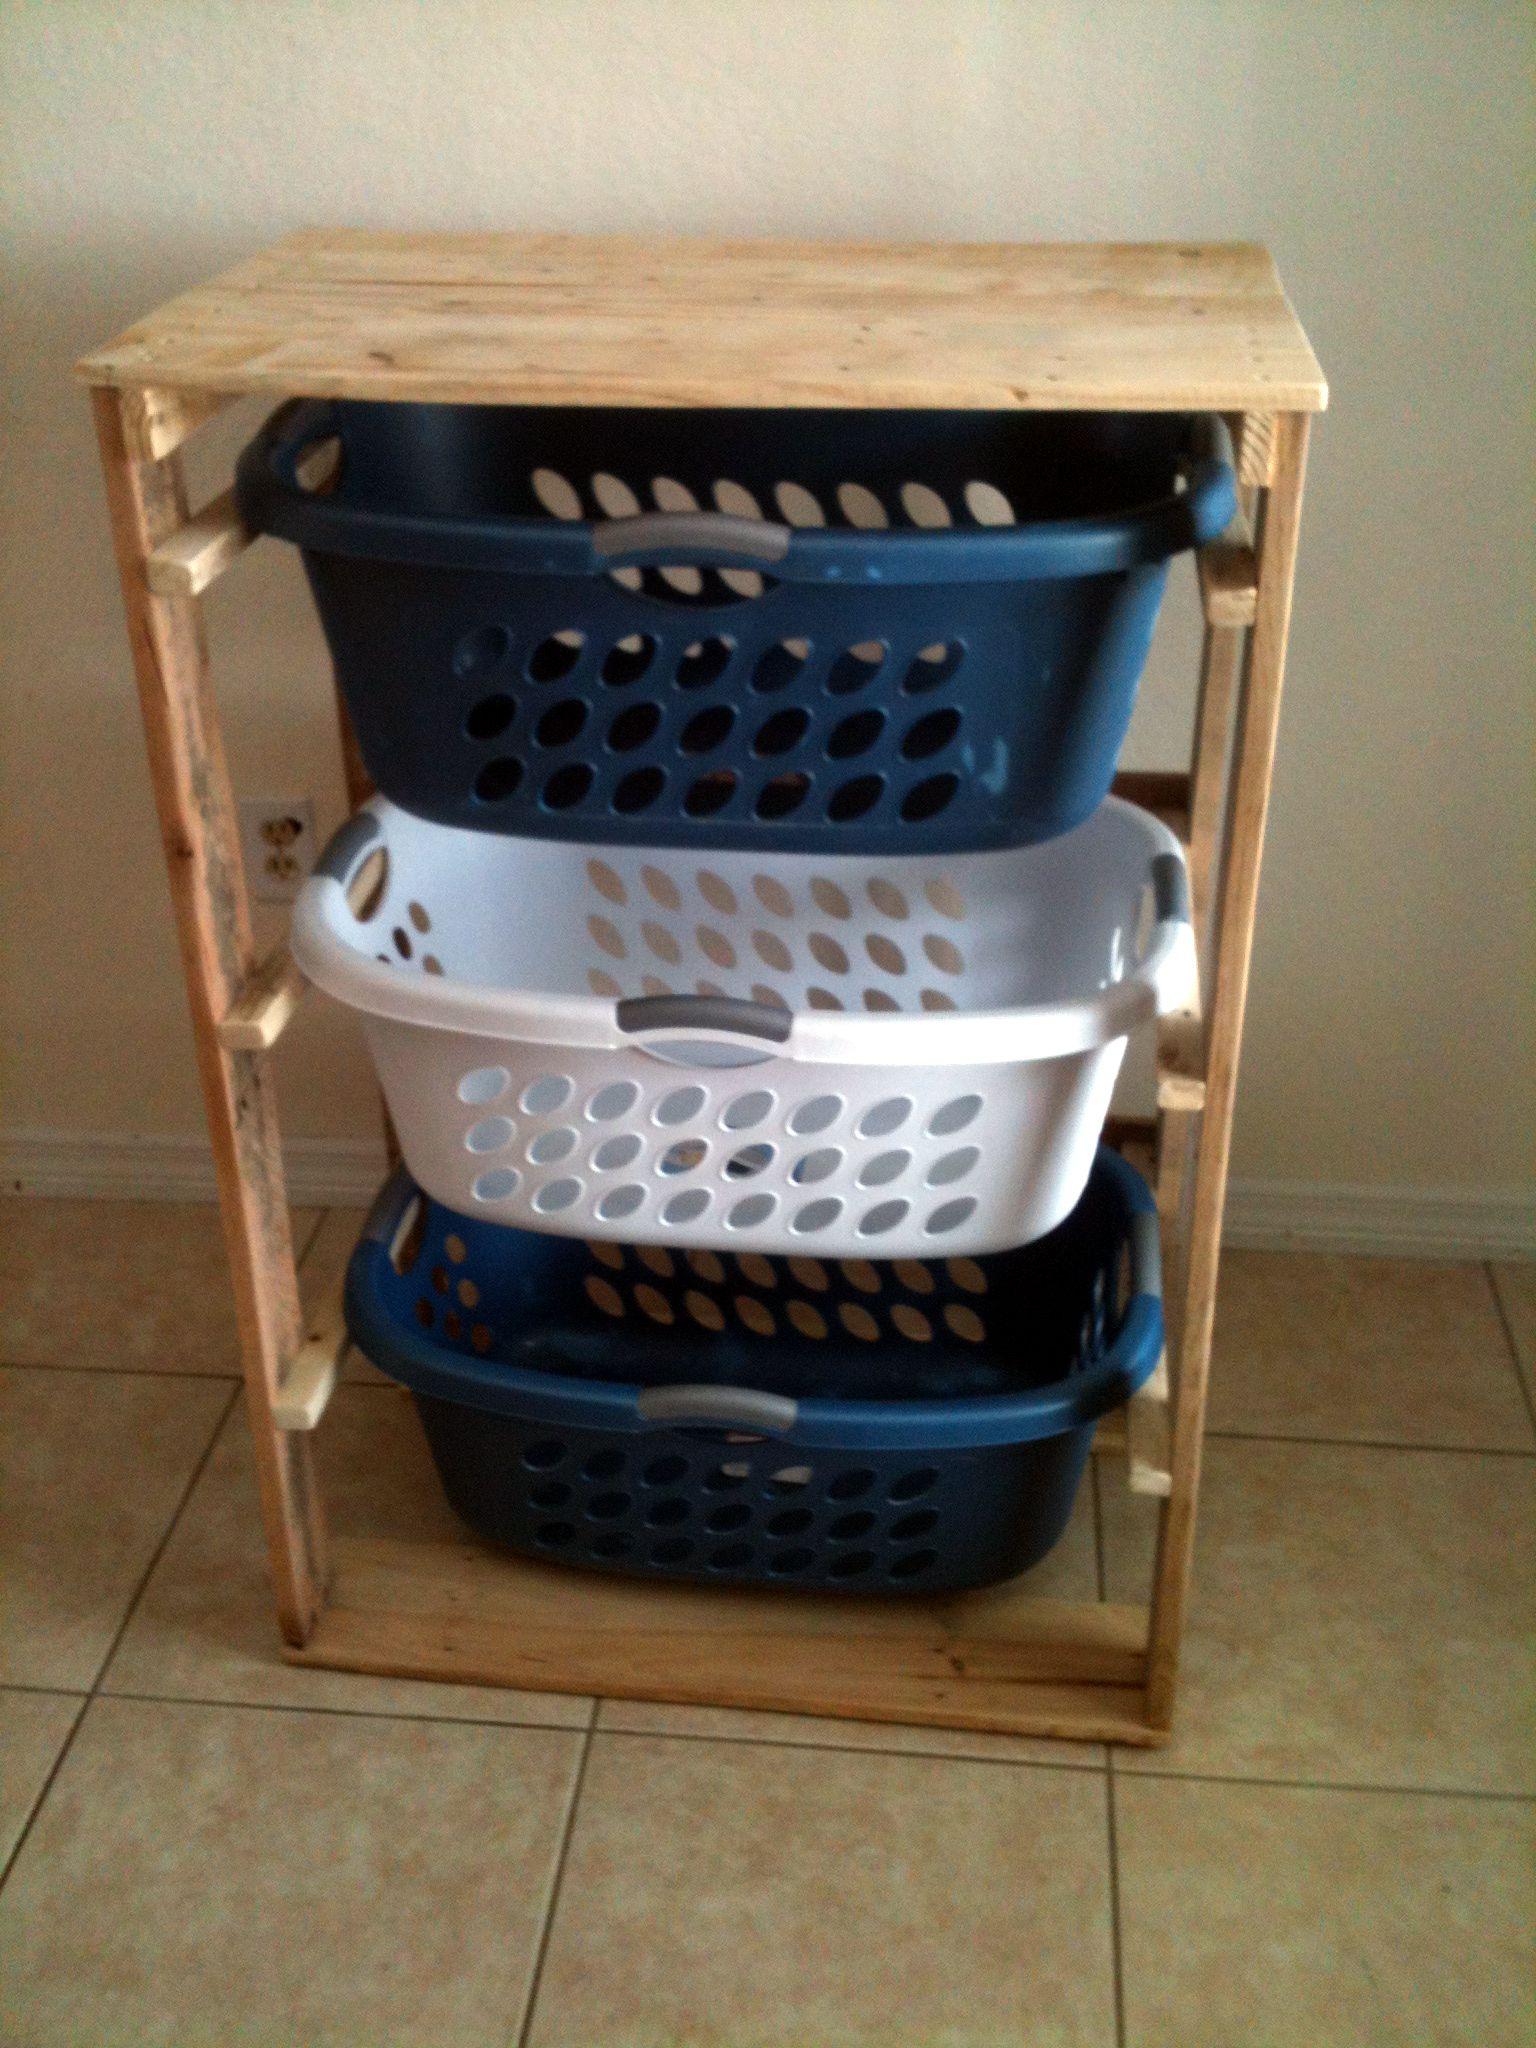 Pallirondack laundry basket dresser do it yourself home projects pallirondack laundry basket dresser do it yourself home projects from ana white solutioingenieria Image collections